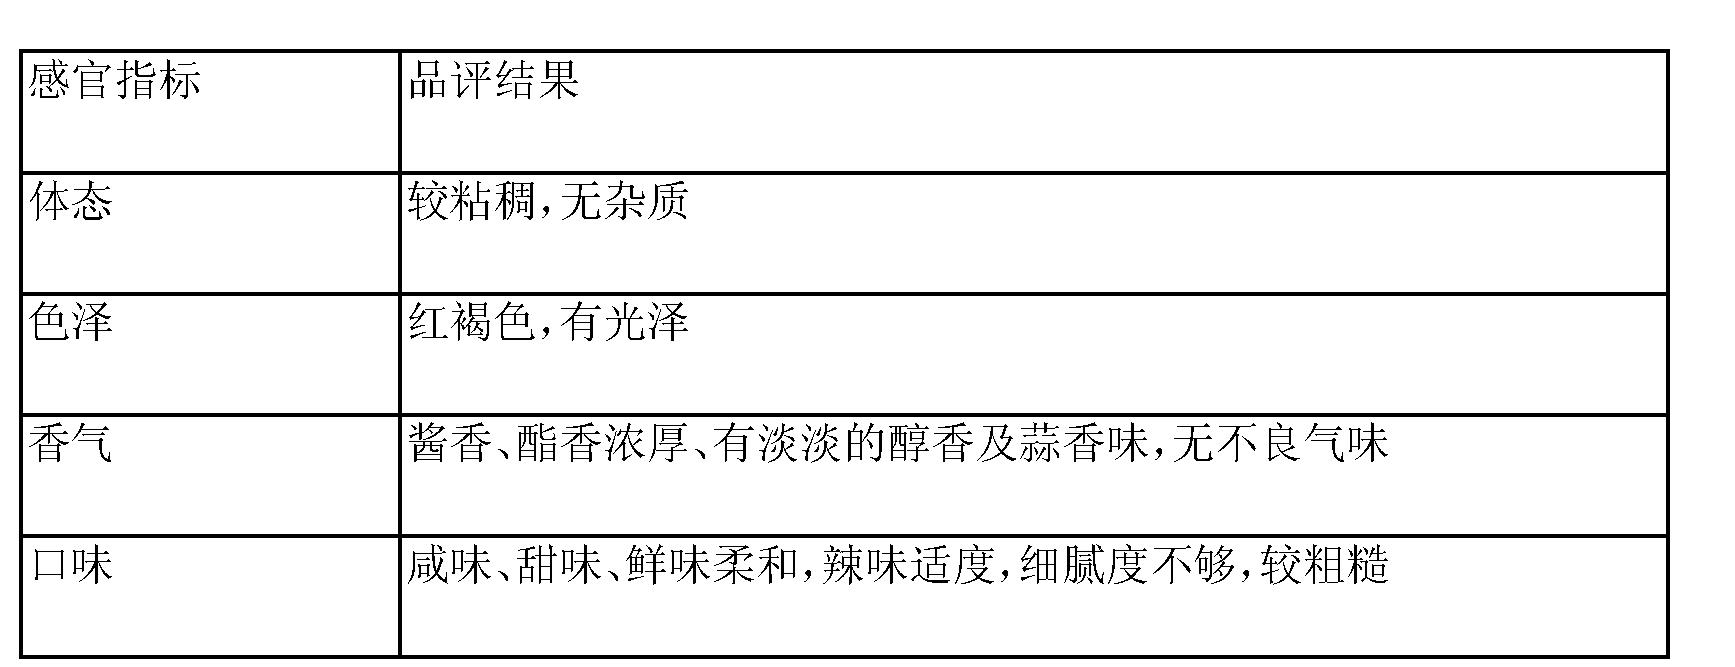 Figure CN103070387AD00212